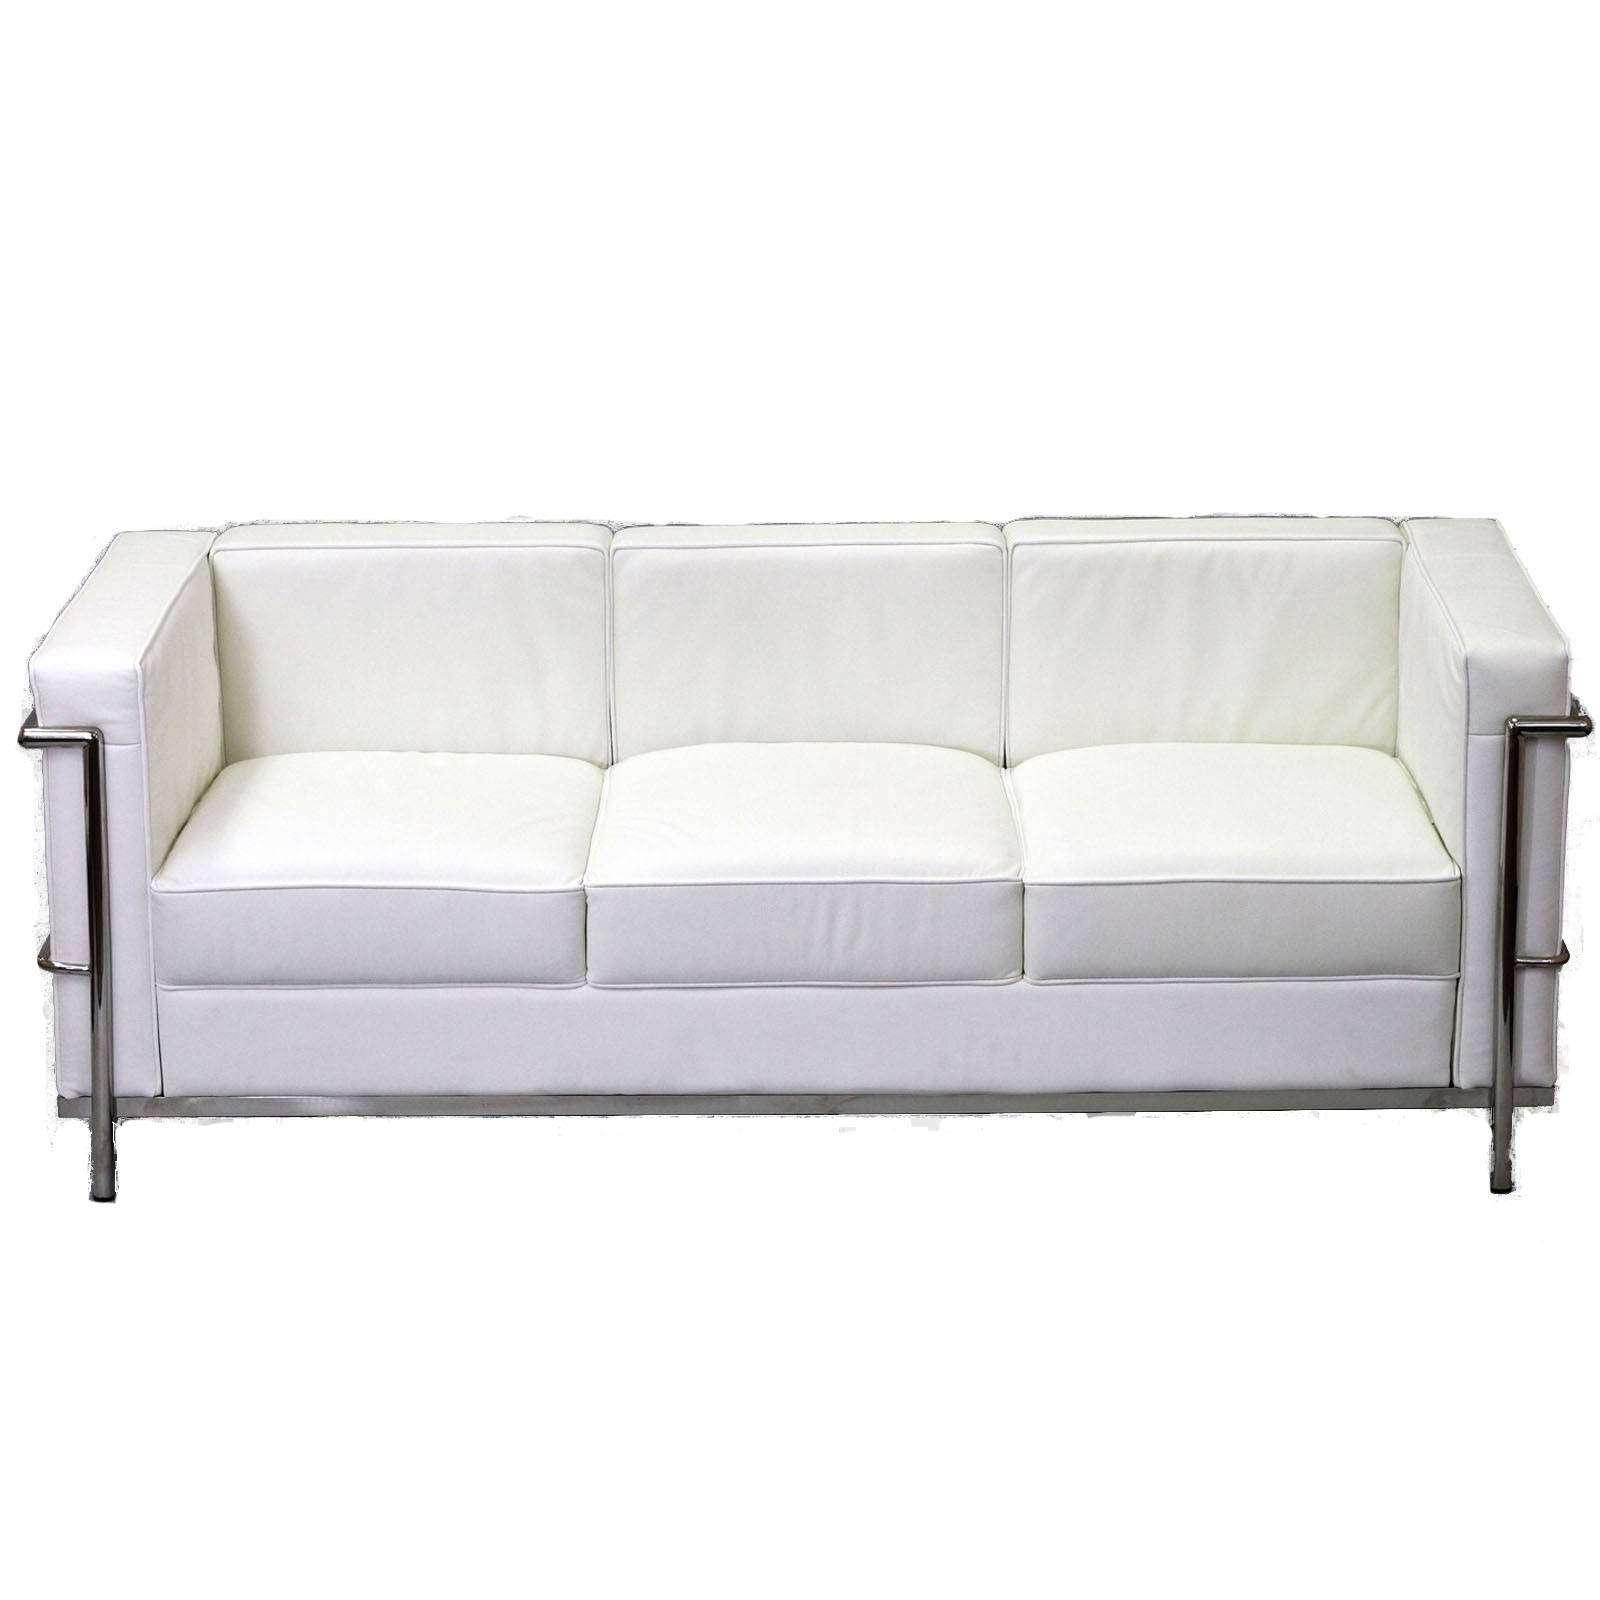 Le Corbusier Style Lc2 Sofa Leather